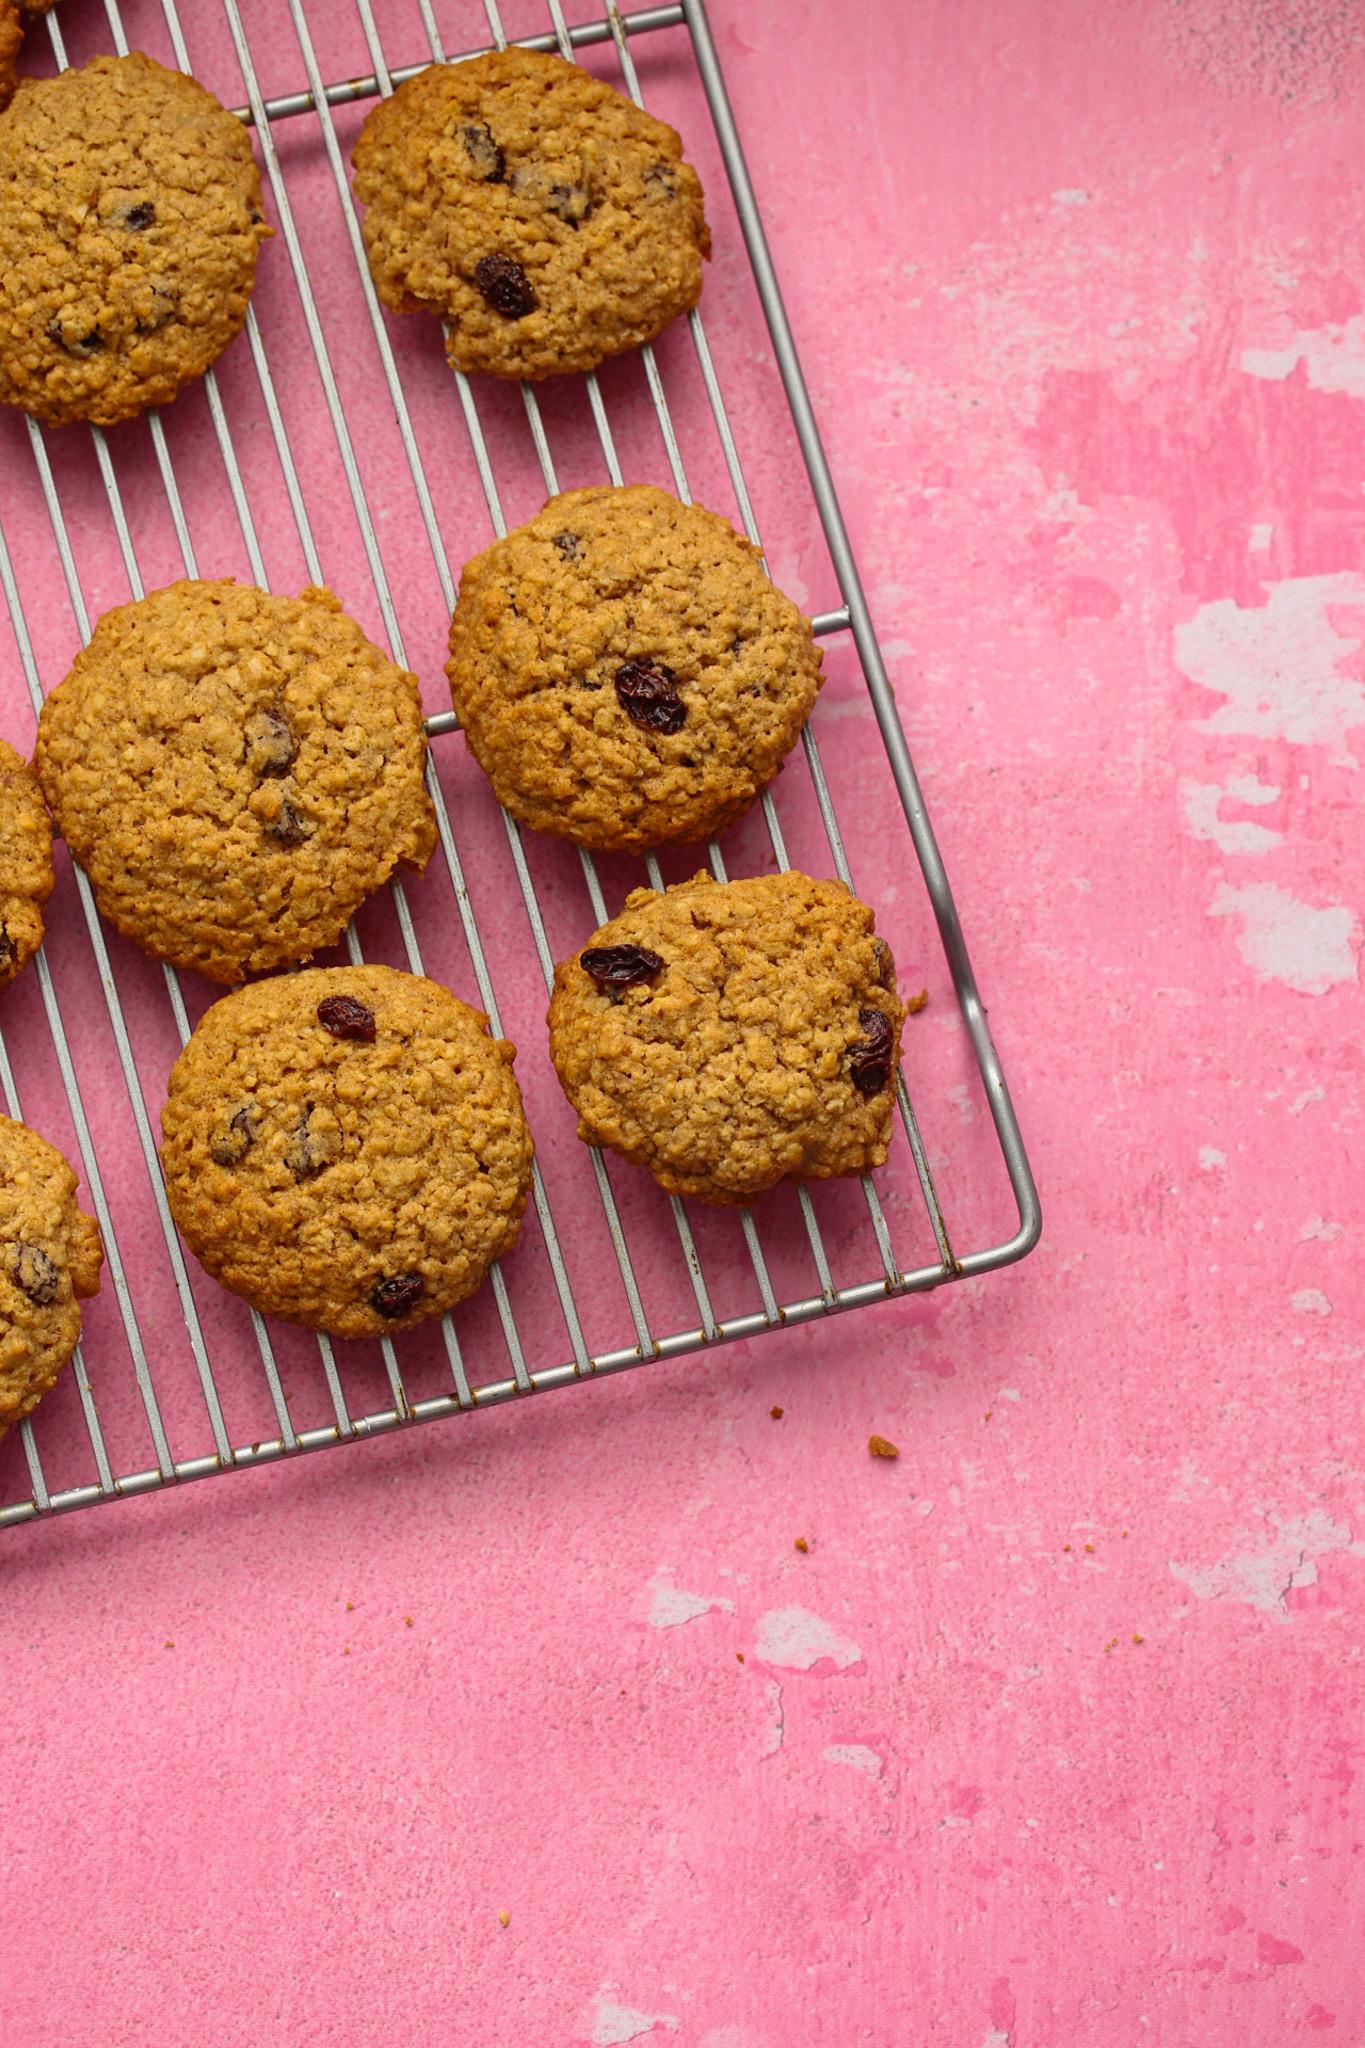 oatmeal raisin cookies on pink background